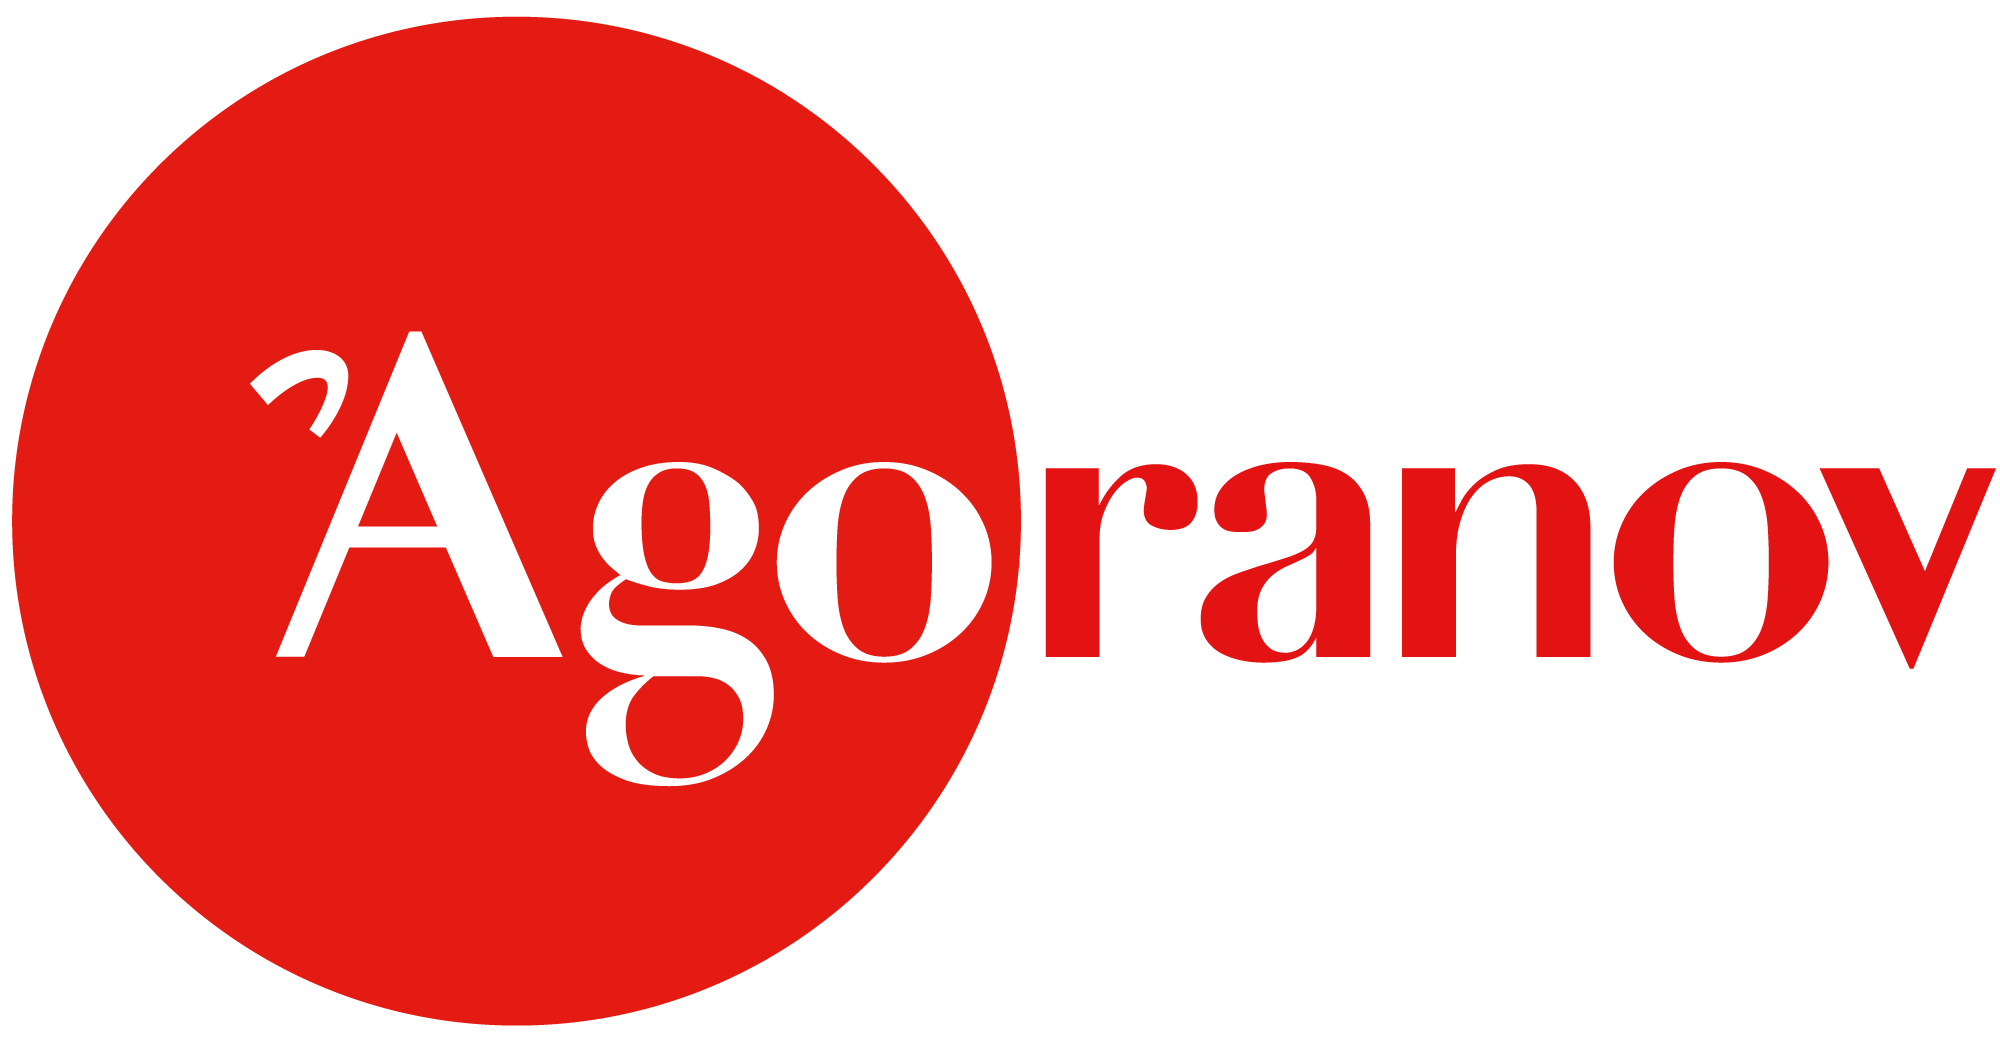 Agoranov logo